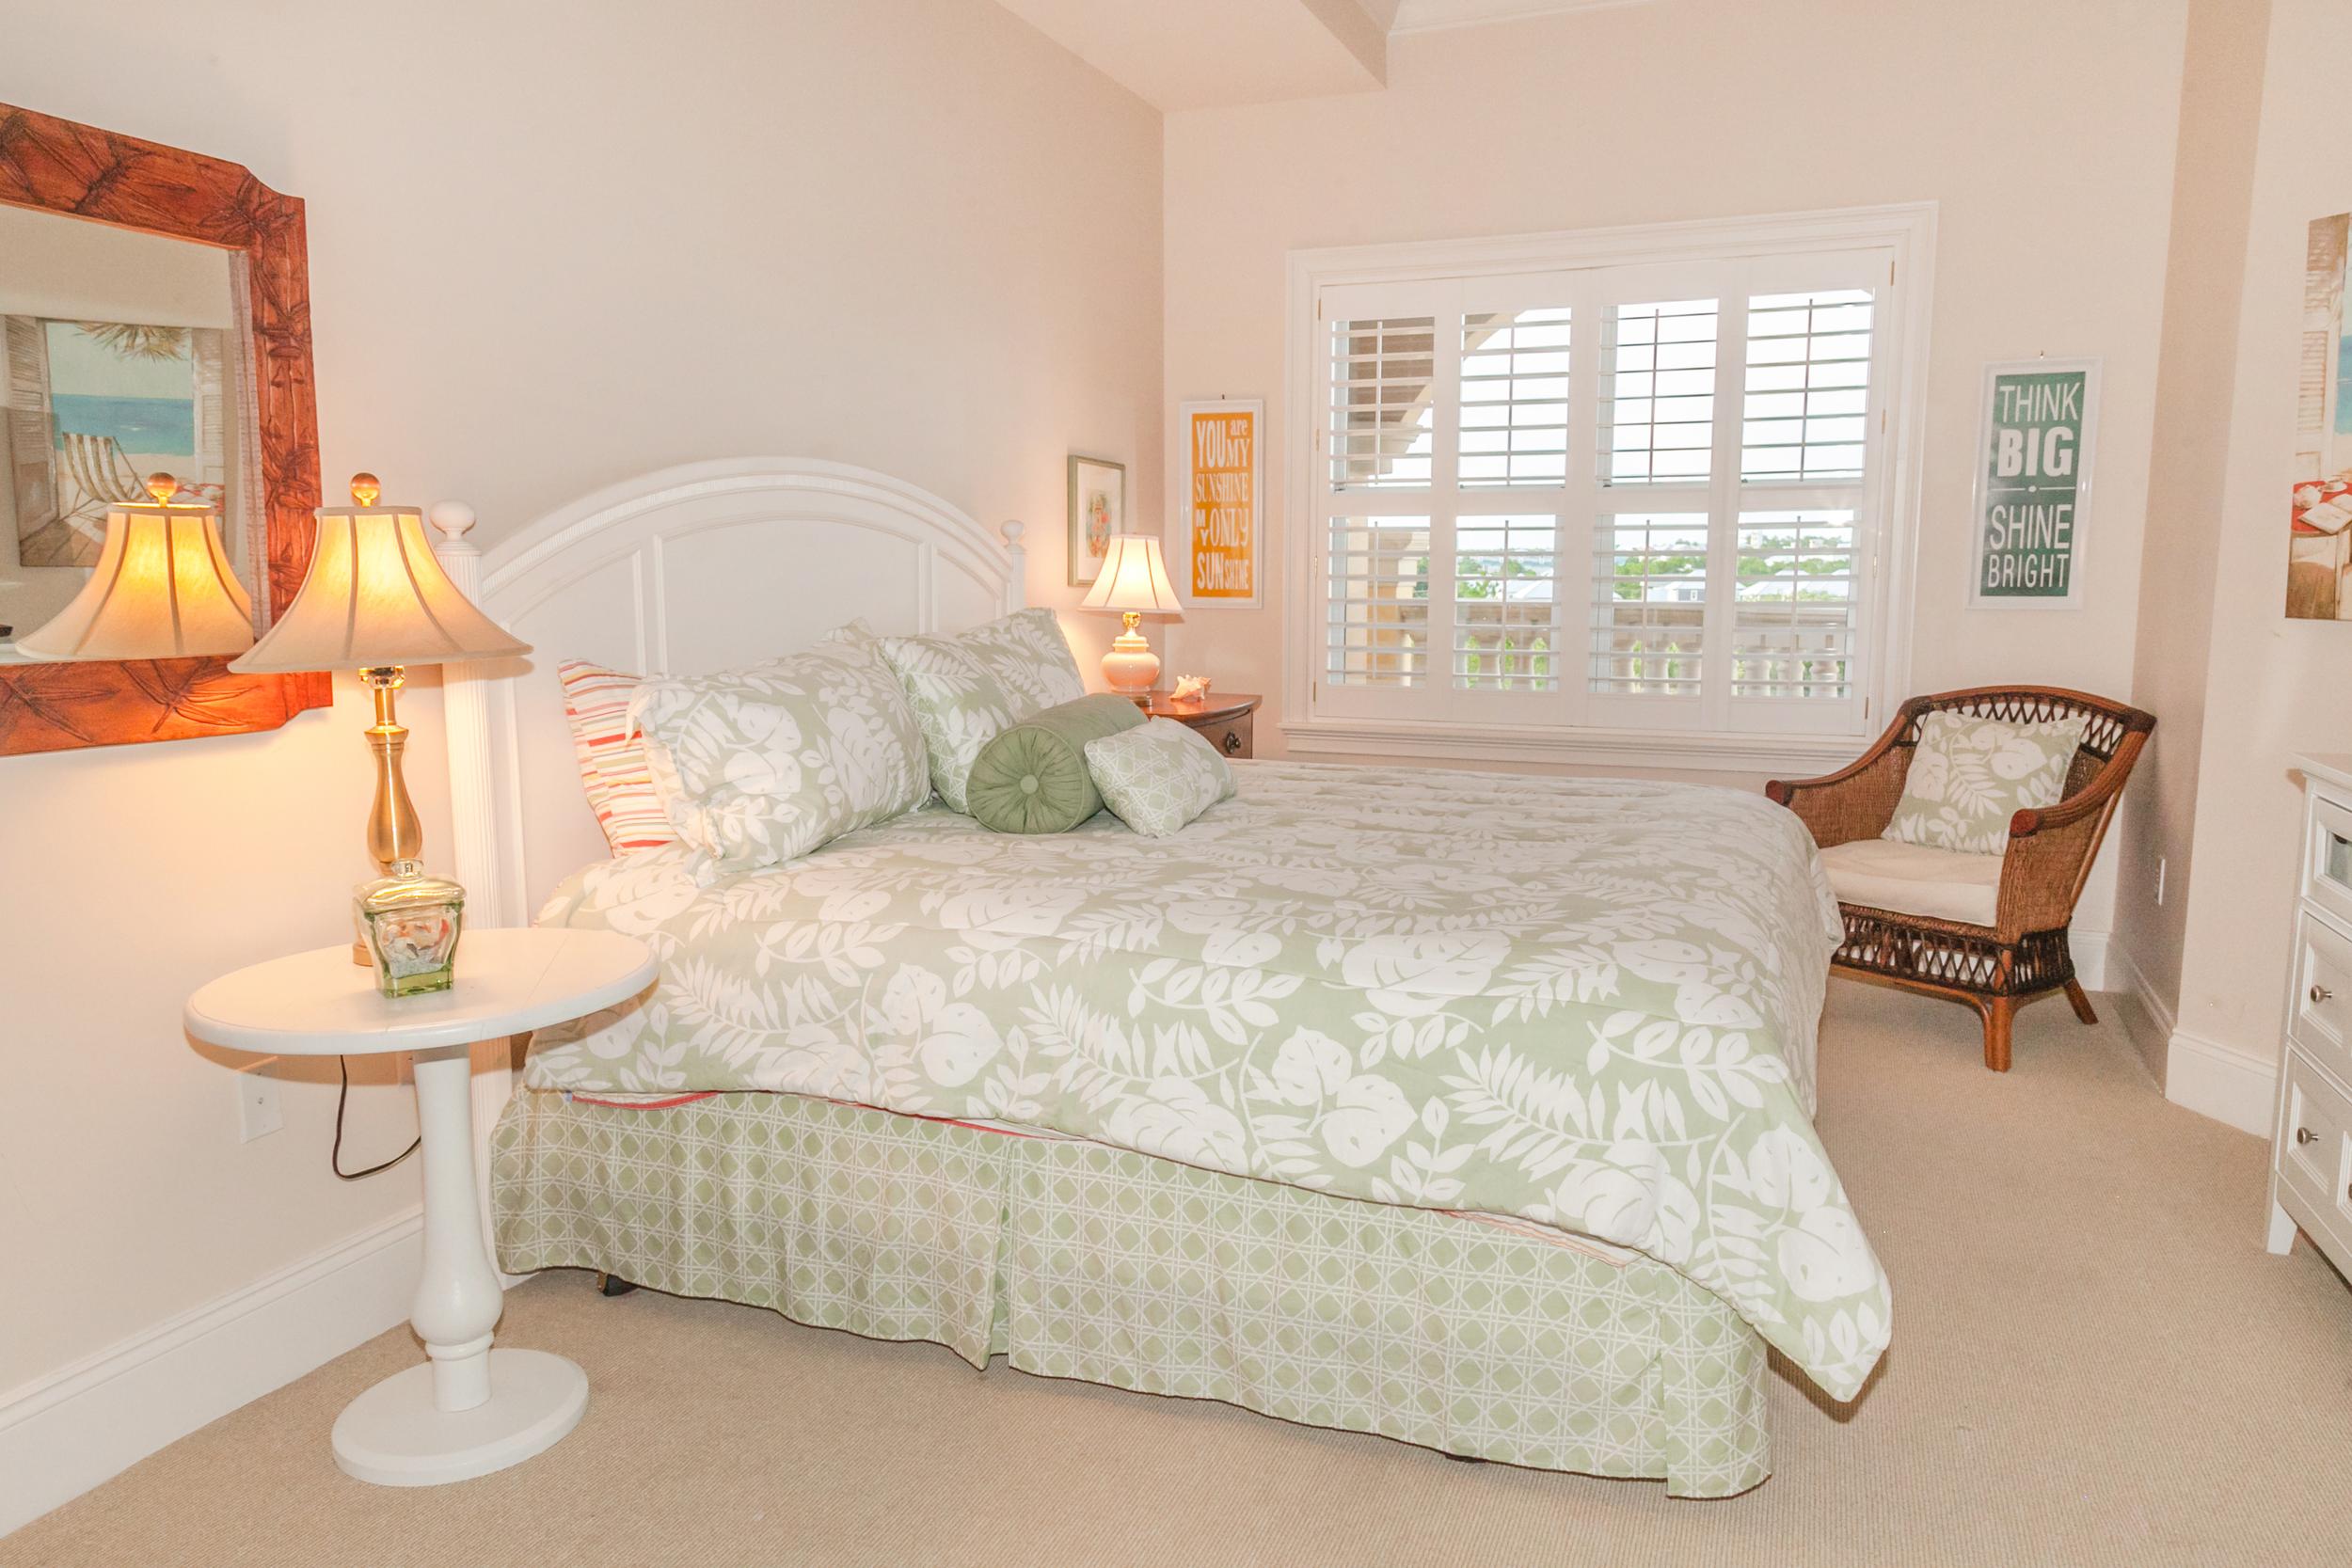 Adagio Penthouse A401 Guest Bedroom